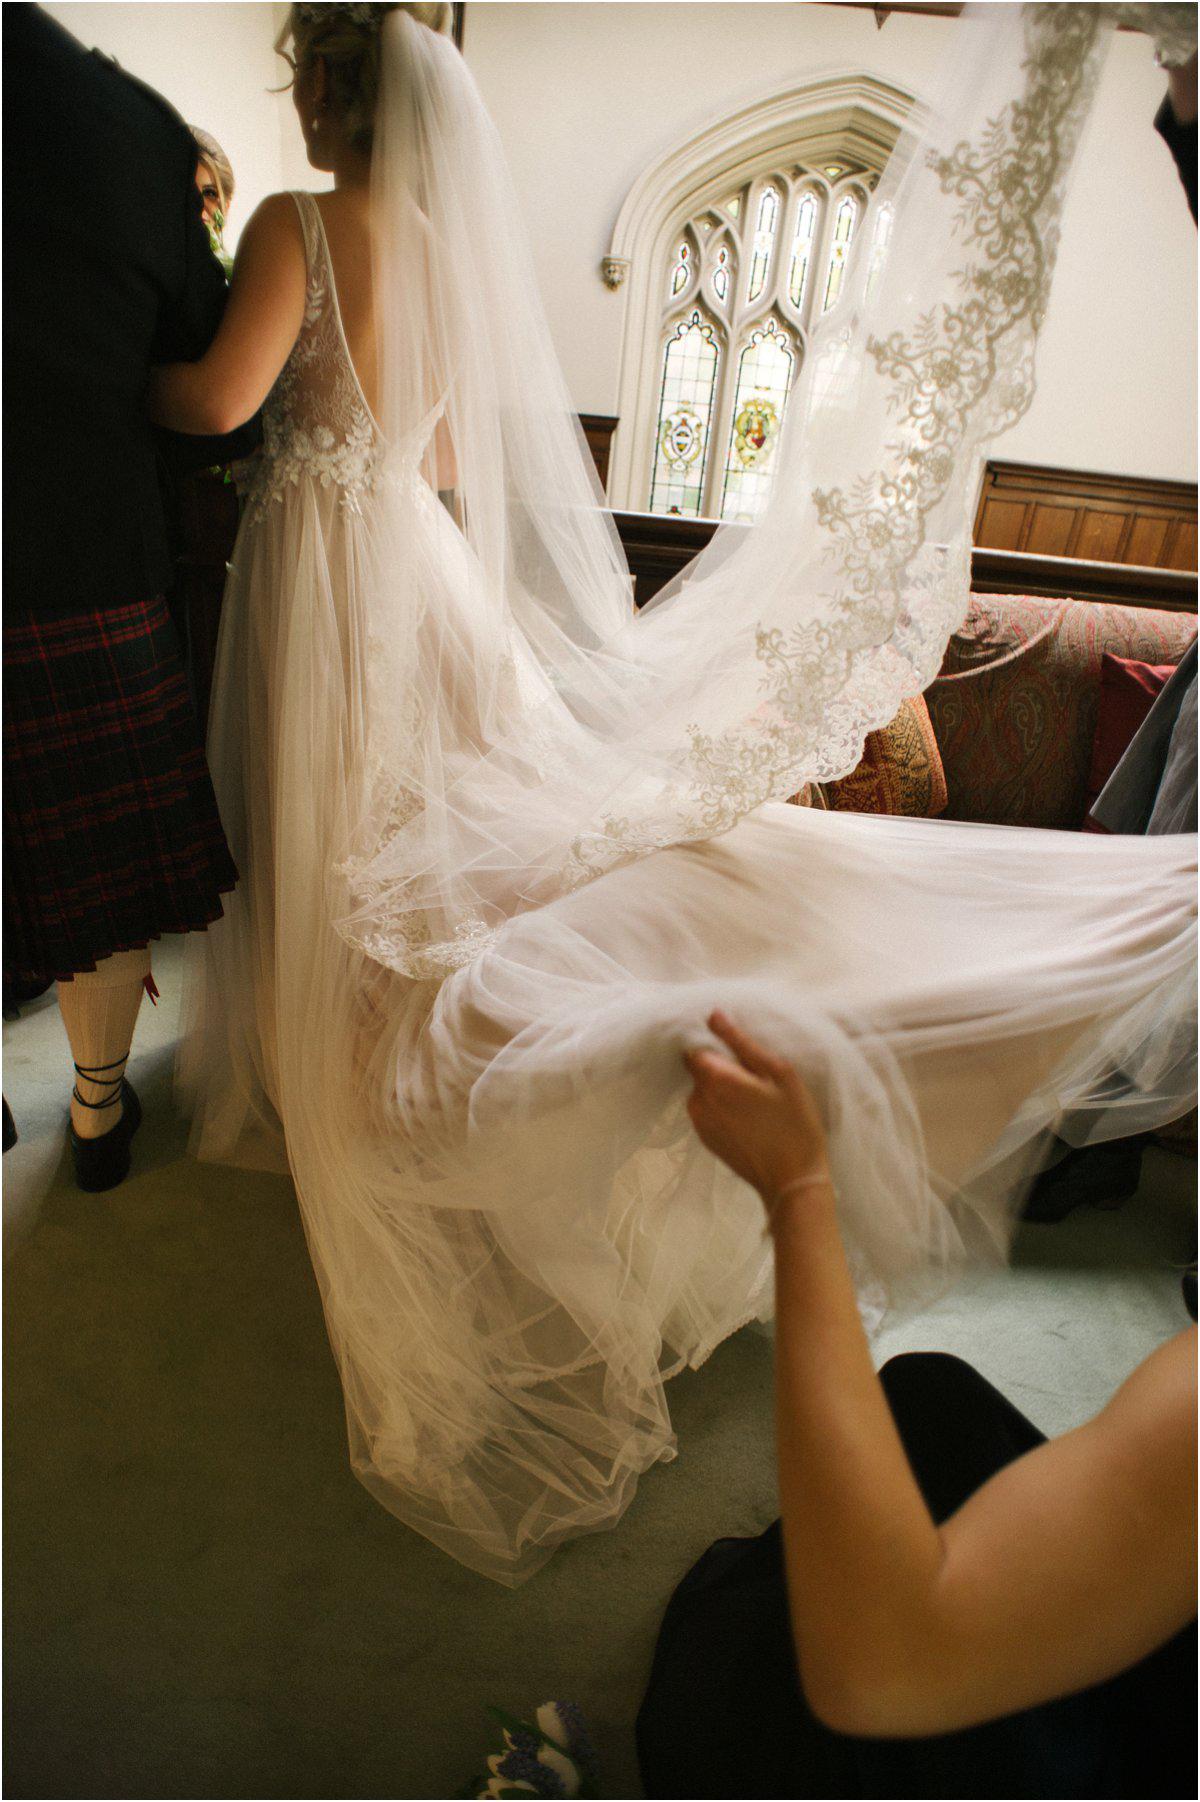 Crofts&Kowalczyk_DundasCastle_WeddingPhotography_Hannah&Tom-29.jpg